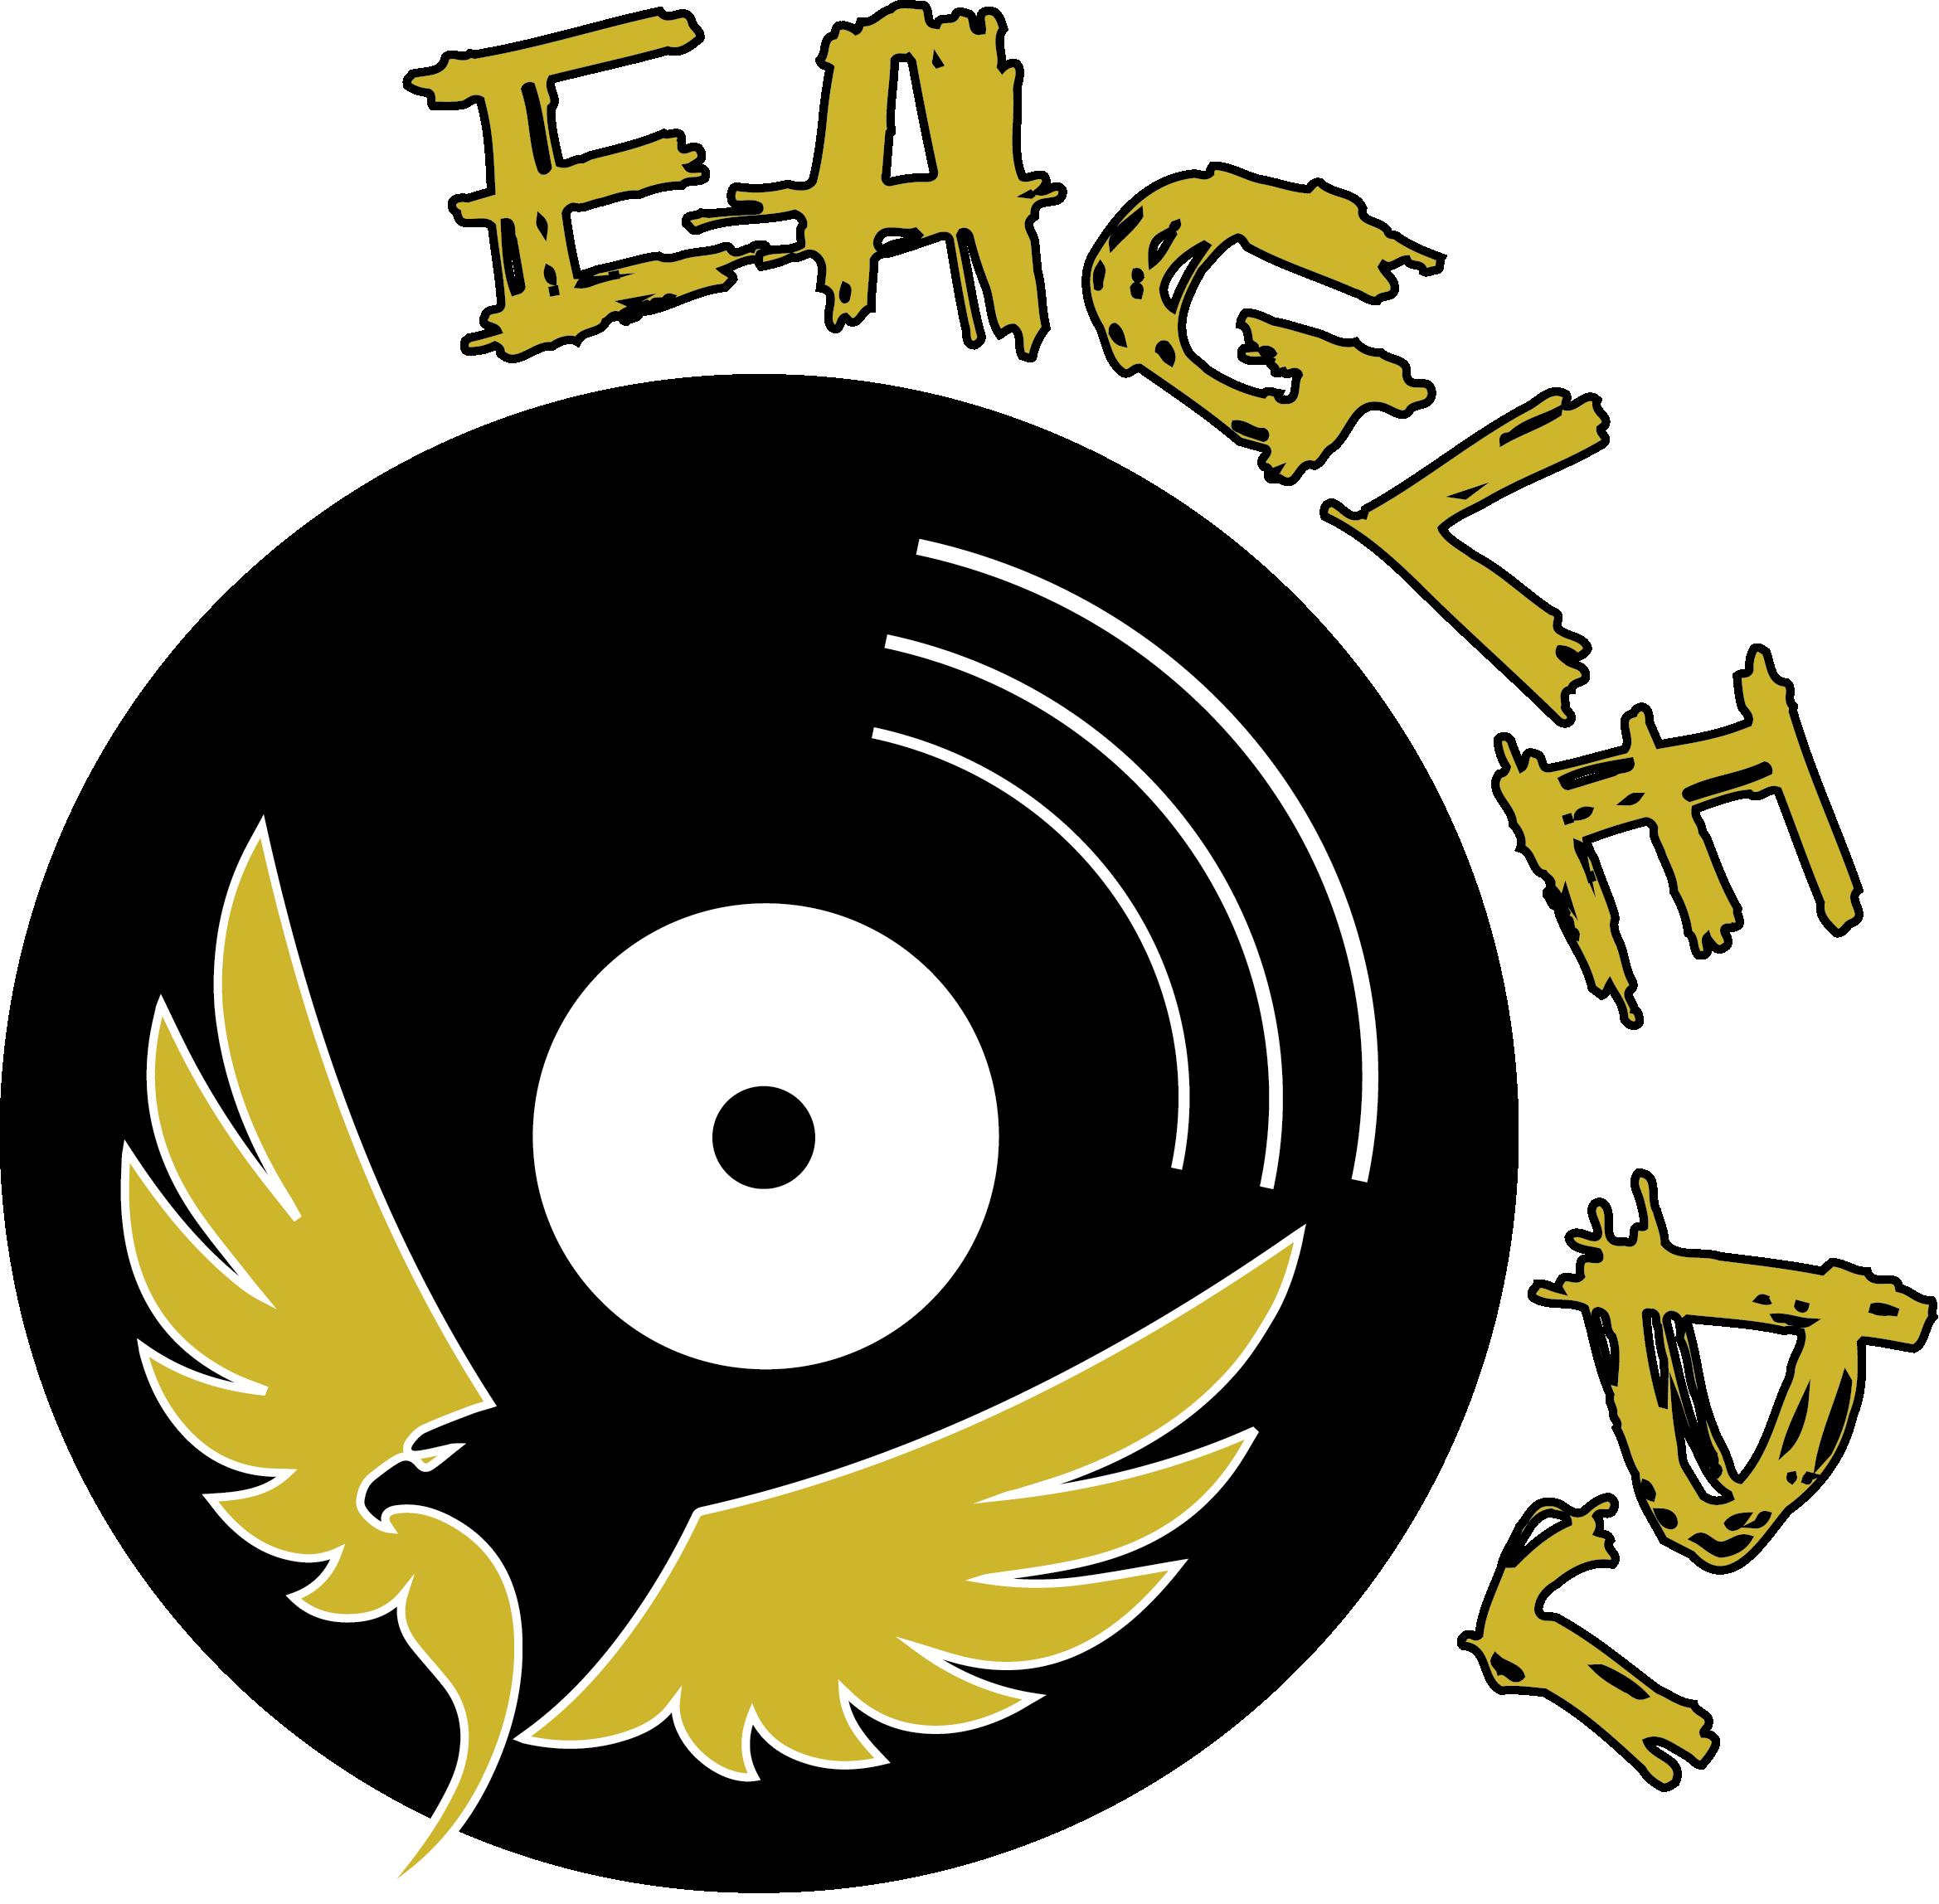 Dj clipart studio light.  eagle png